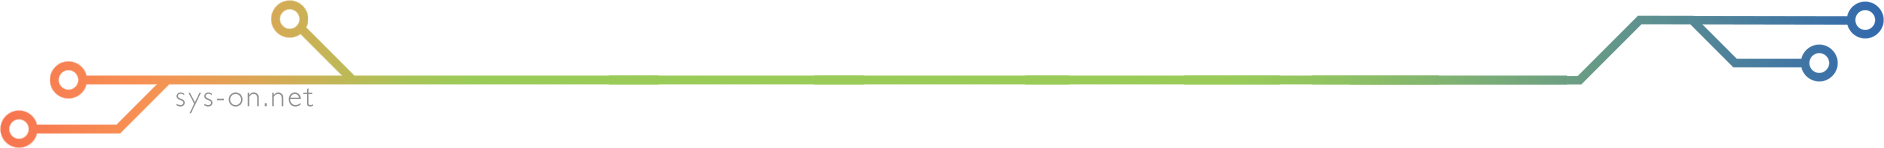 SeparatorNet - تطبيق Owly for Twitter لتصفح تويتر بمتعة أكبر بتصميم بسيط وجميل